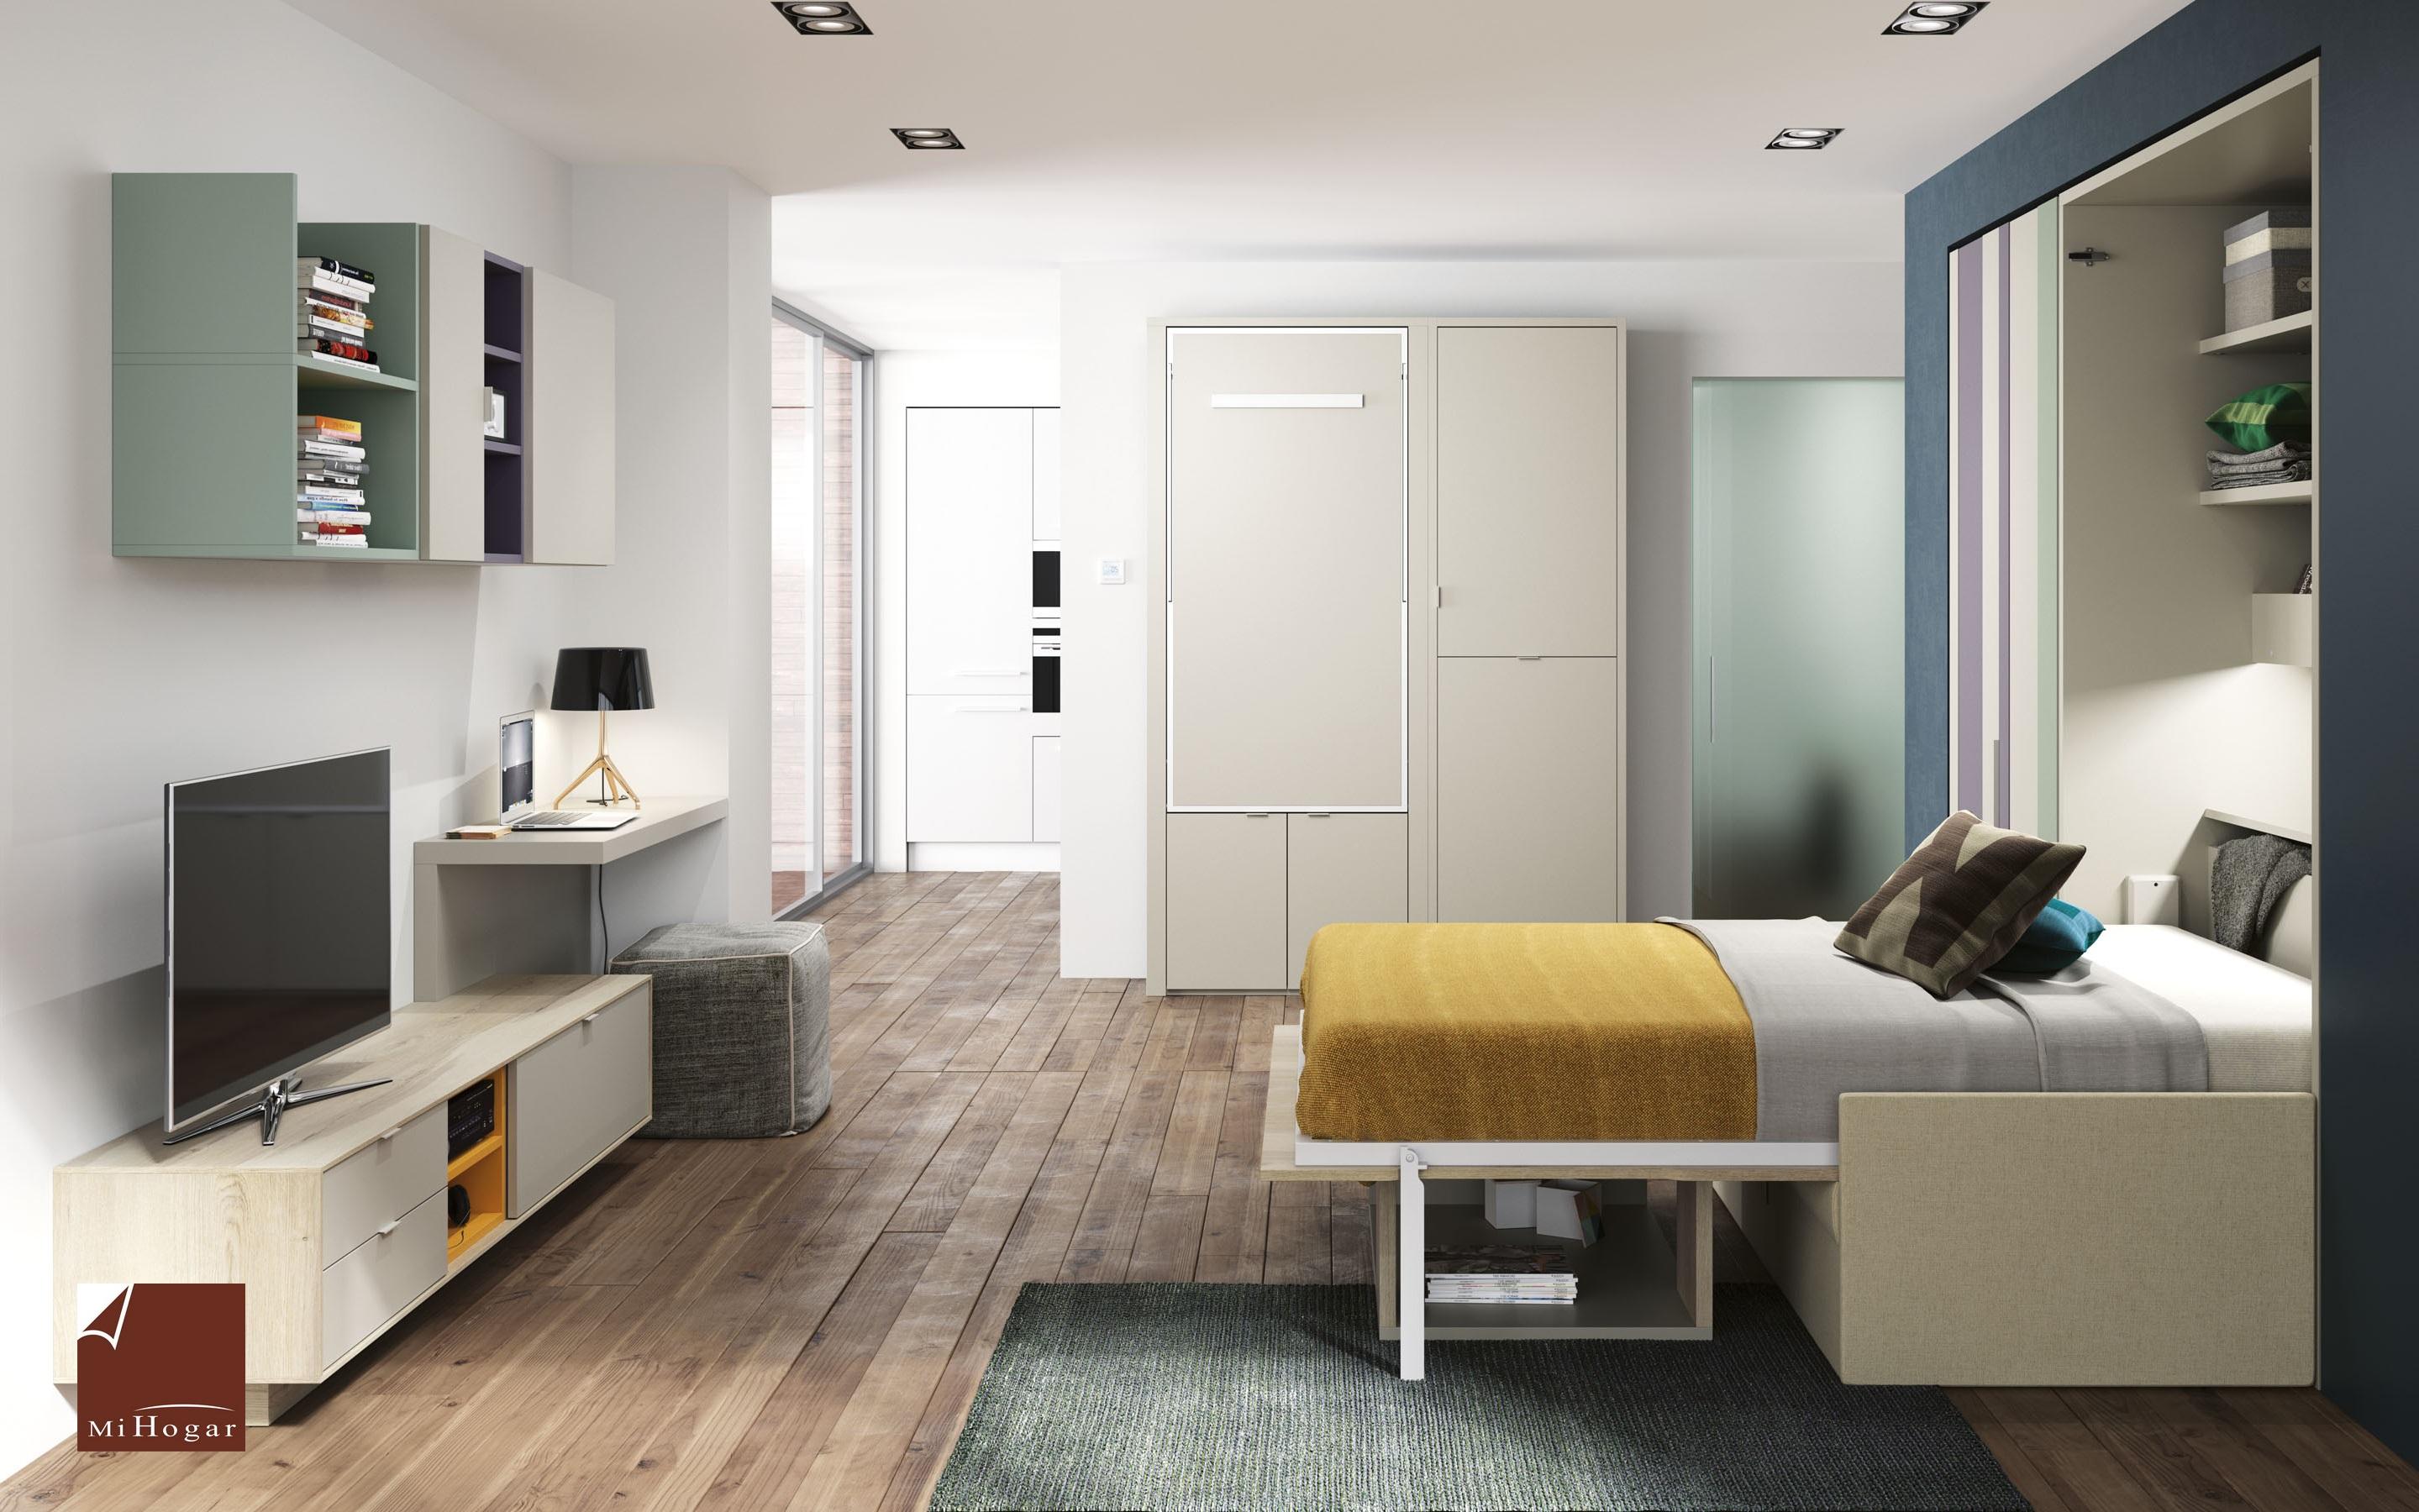 Cama abatible vertical con sofa tmb muebles mi hogar for Camas abatibles juveniles